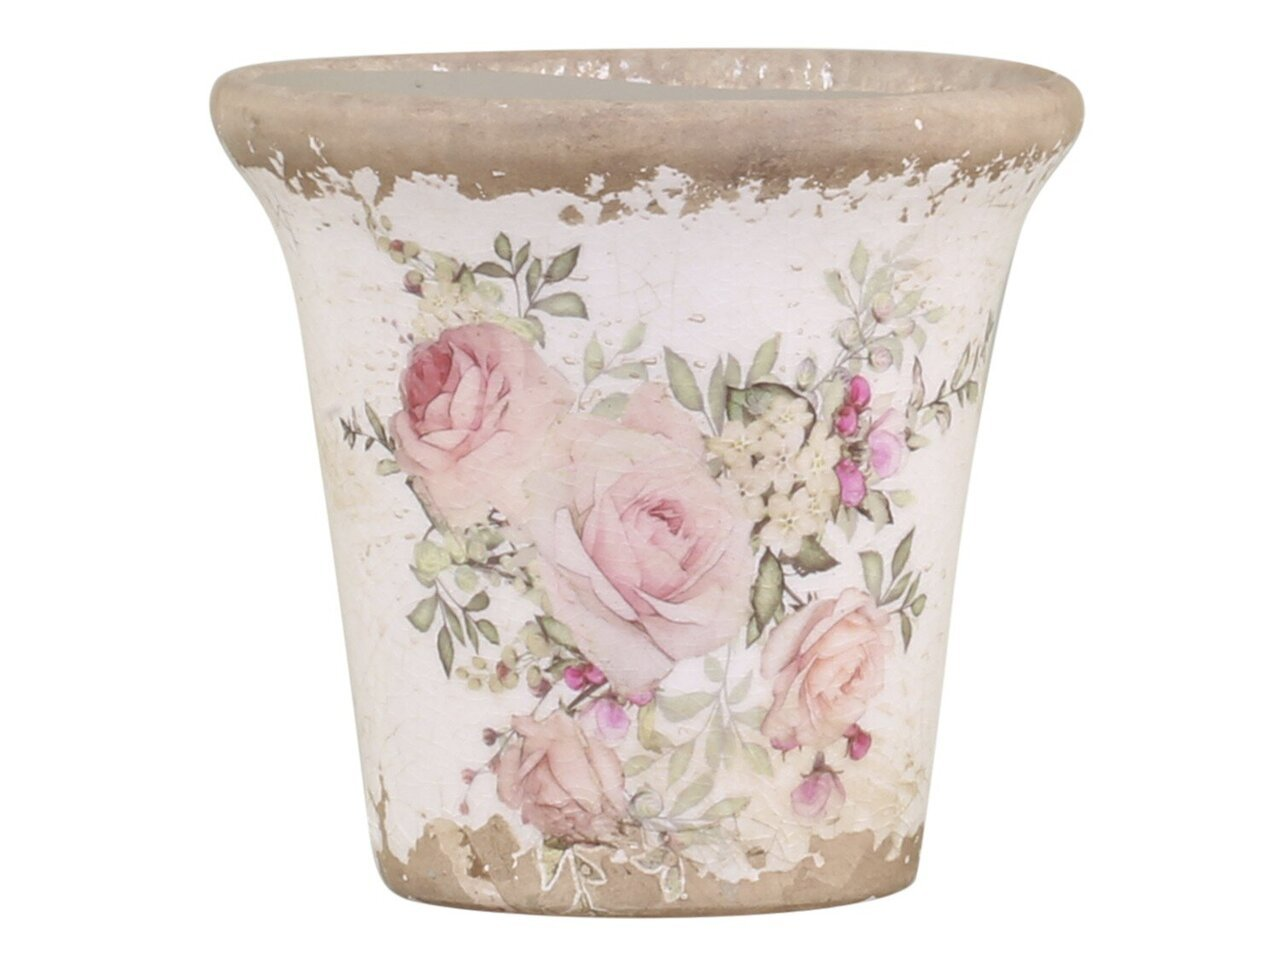 Chic Antique Naves Blumentopf mit Rosenmuster